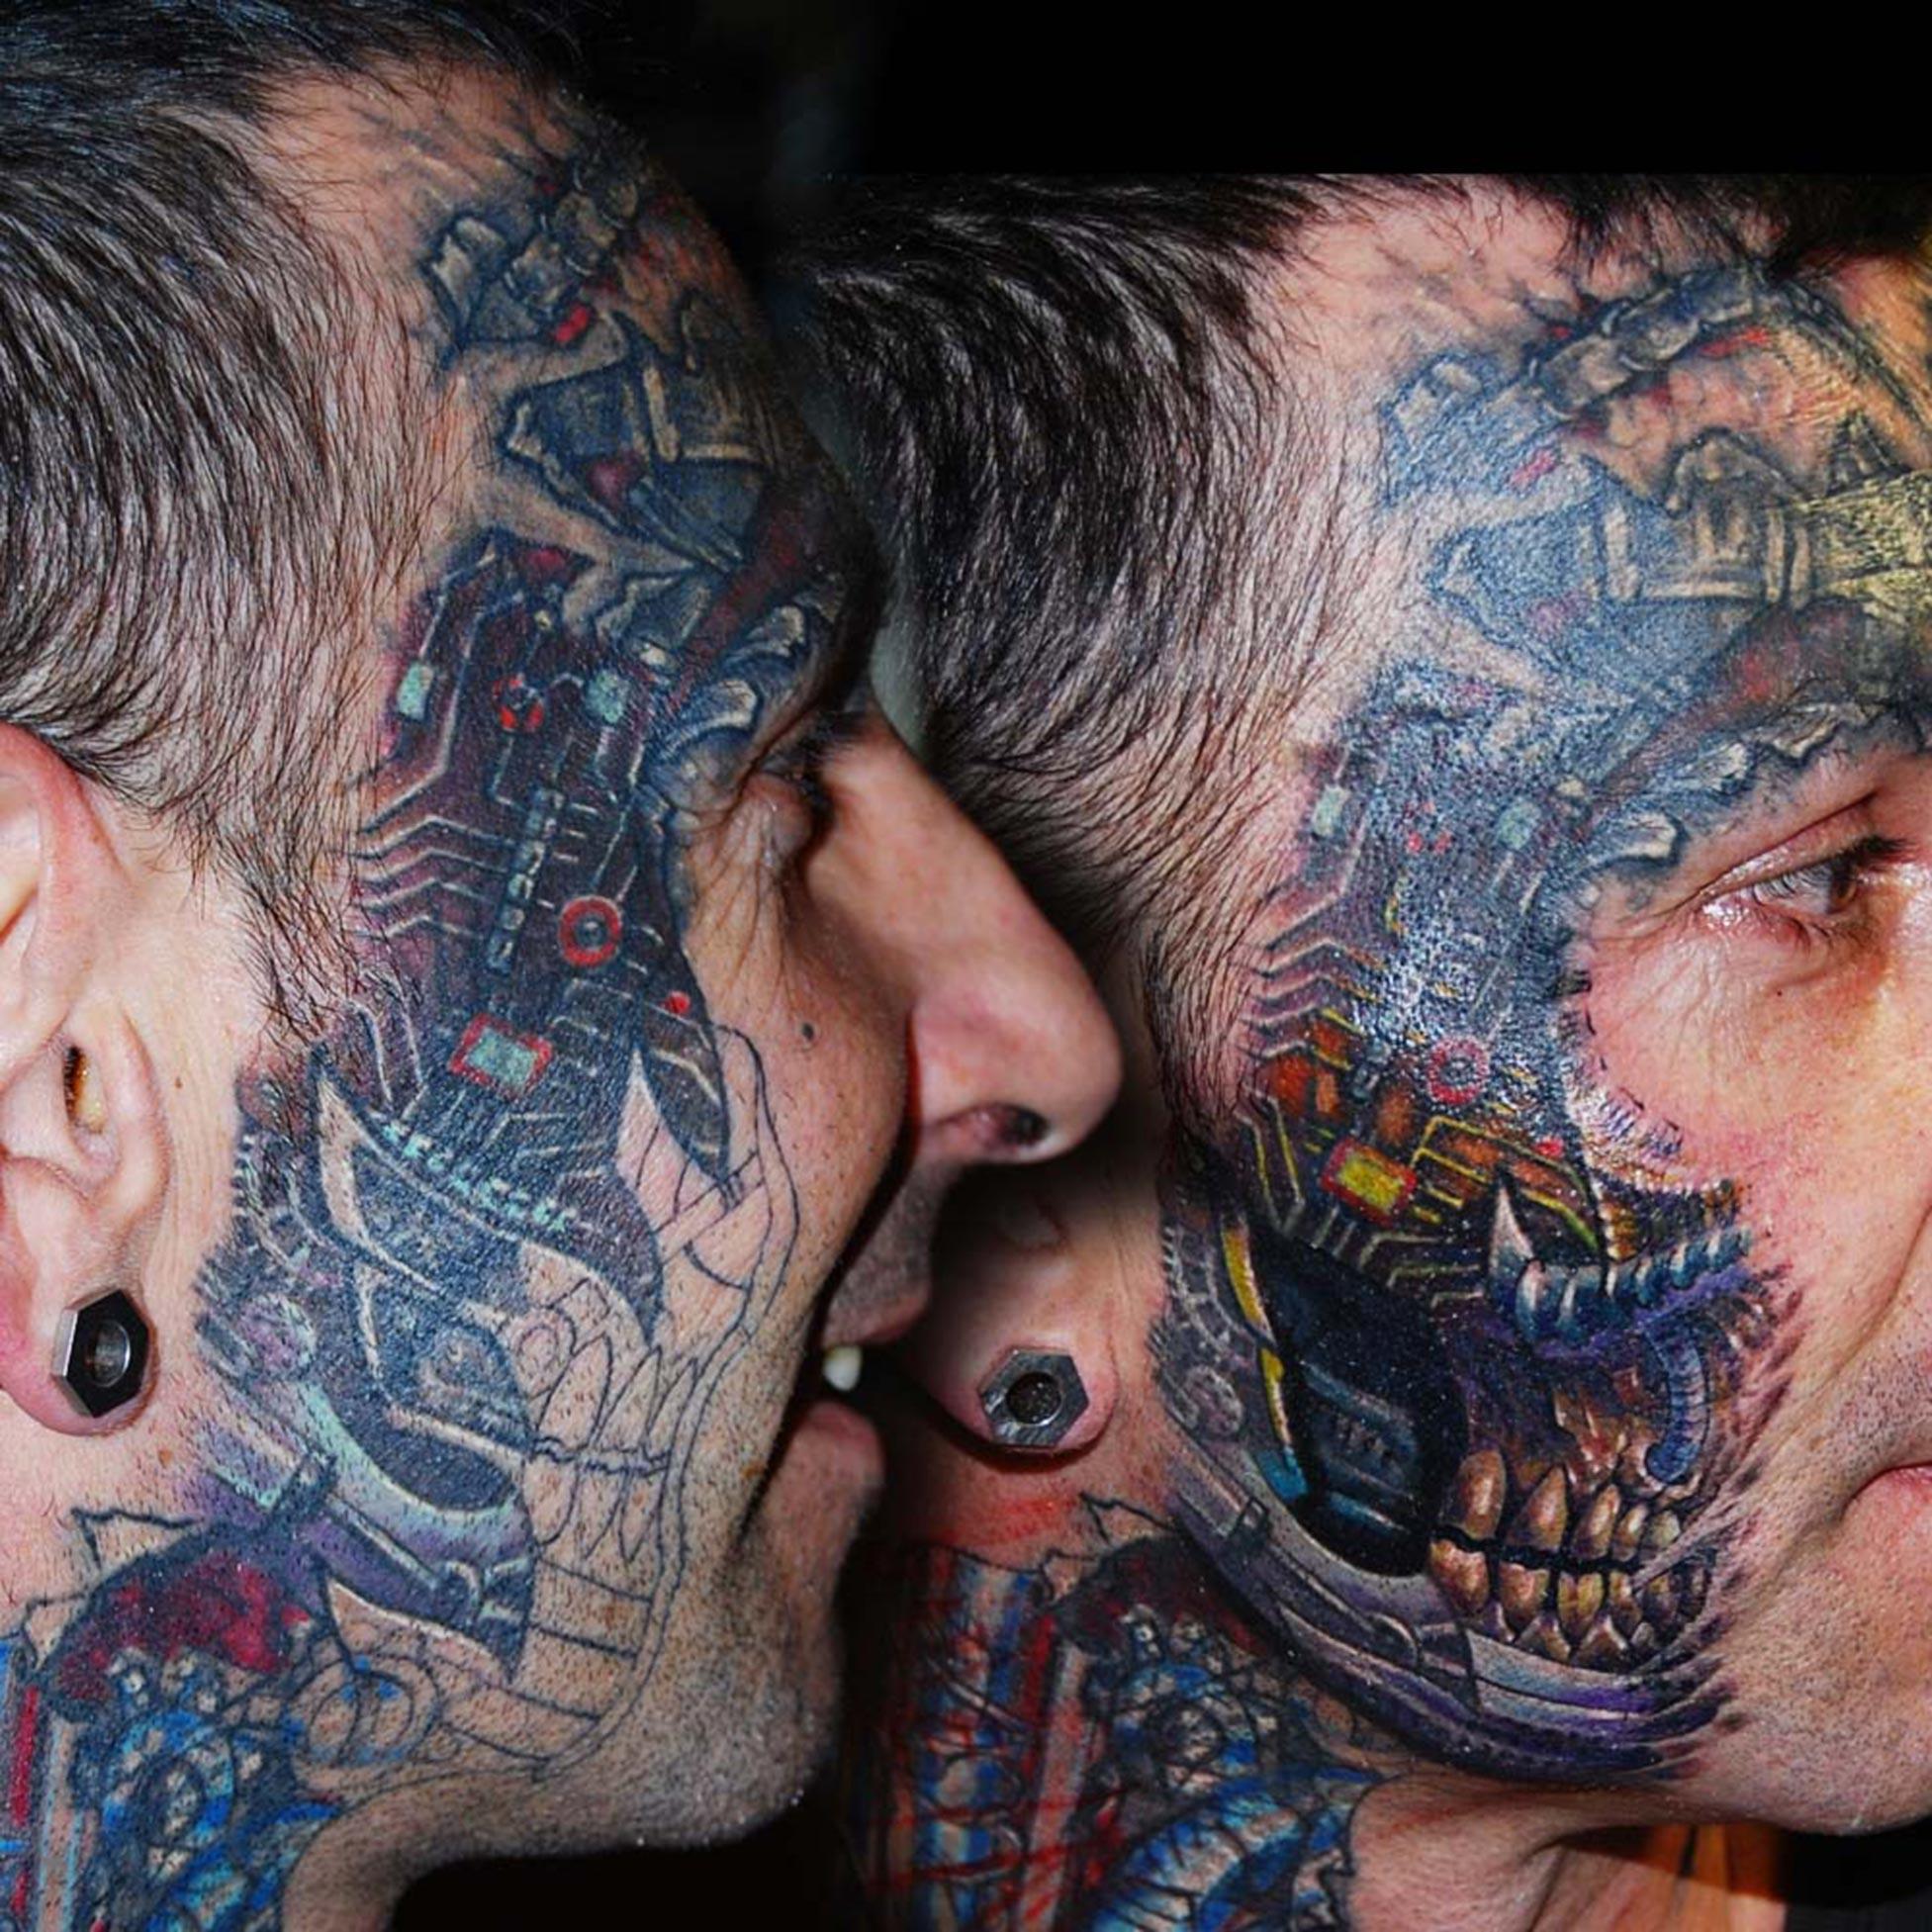 Biomechanik Gesichts Tattoo Coverup Überdeckung Raul Hits for Life Tattoo